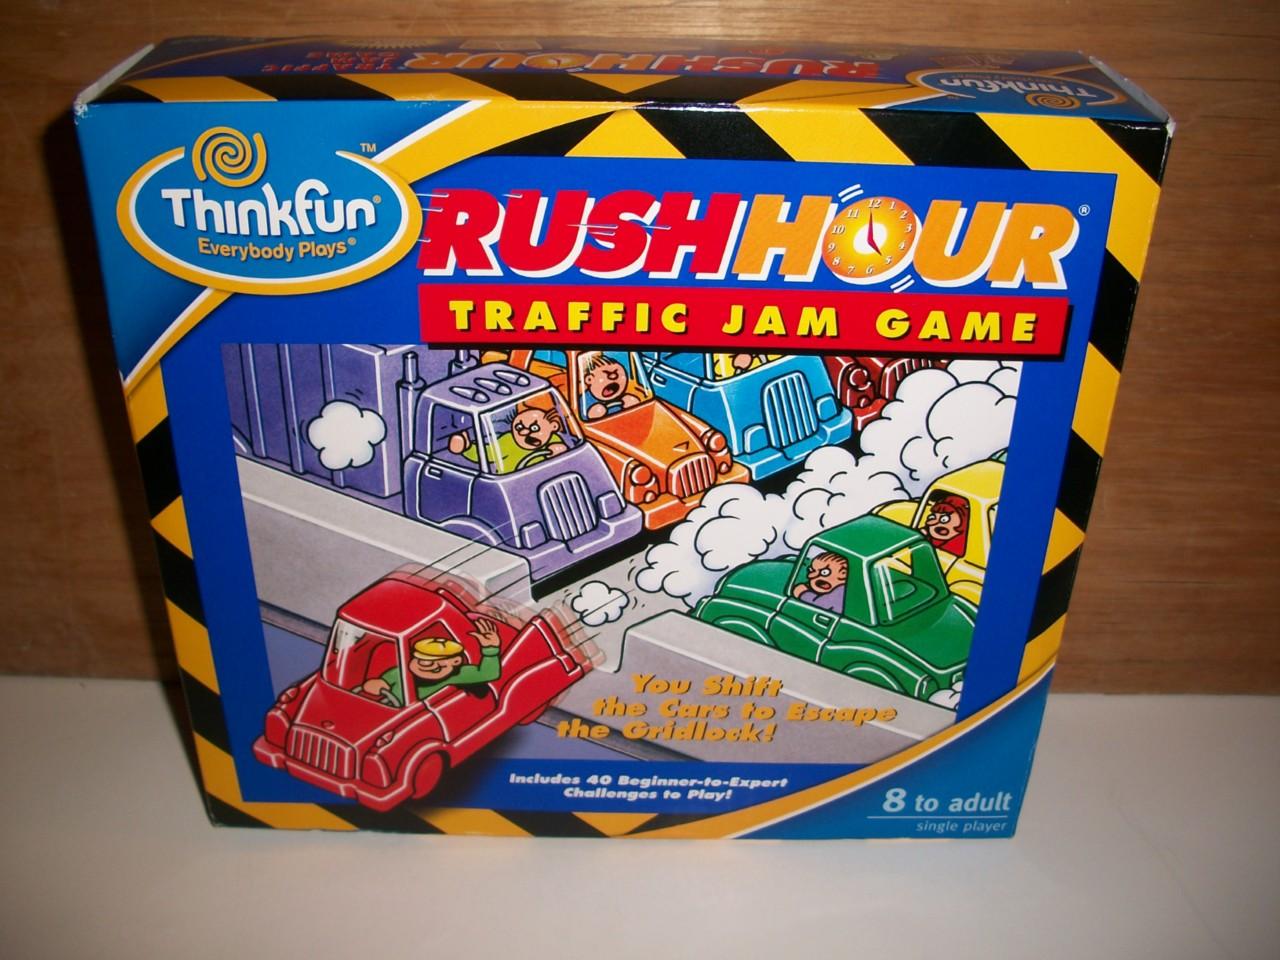 think fun rush hour traffic jam game original handheld traffic jam